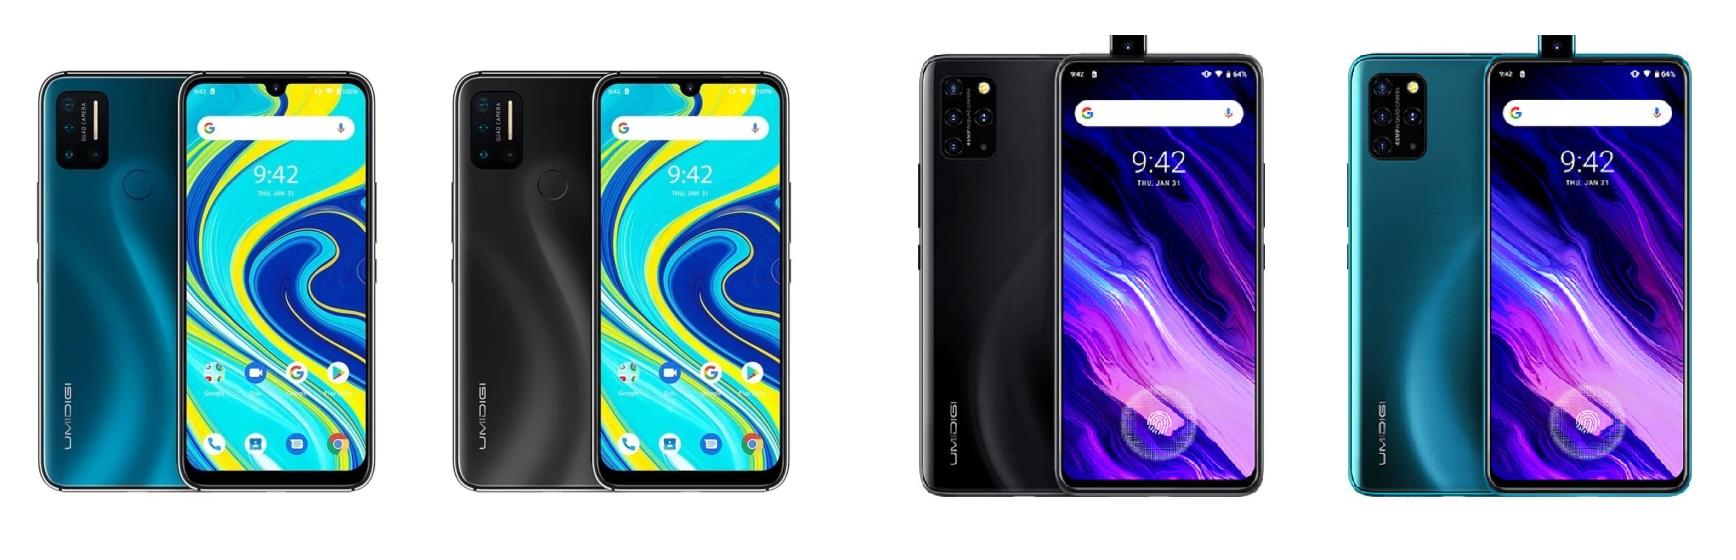 Smartphones Umidigi A7 Pro en Umidigi S5 Pro dikke korting @ Aliexpress